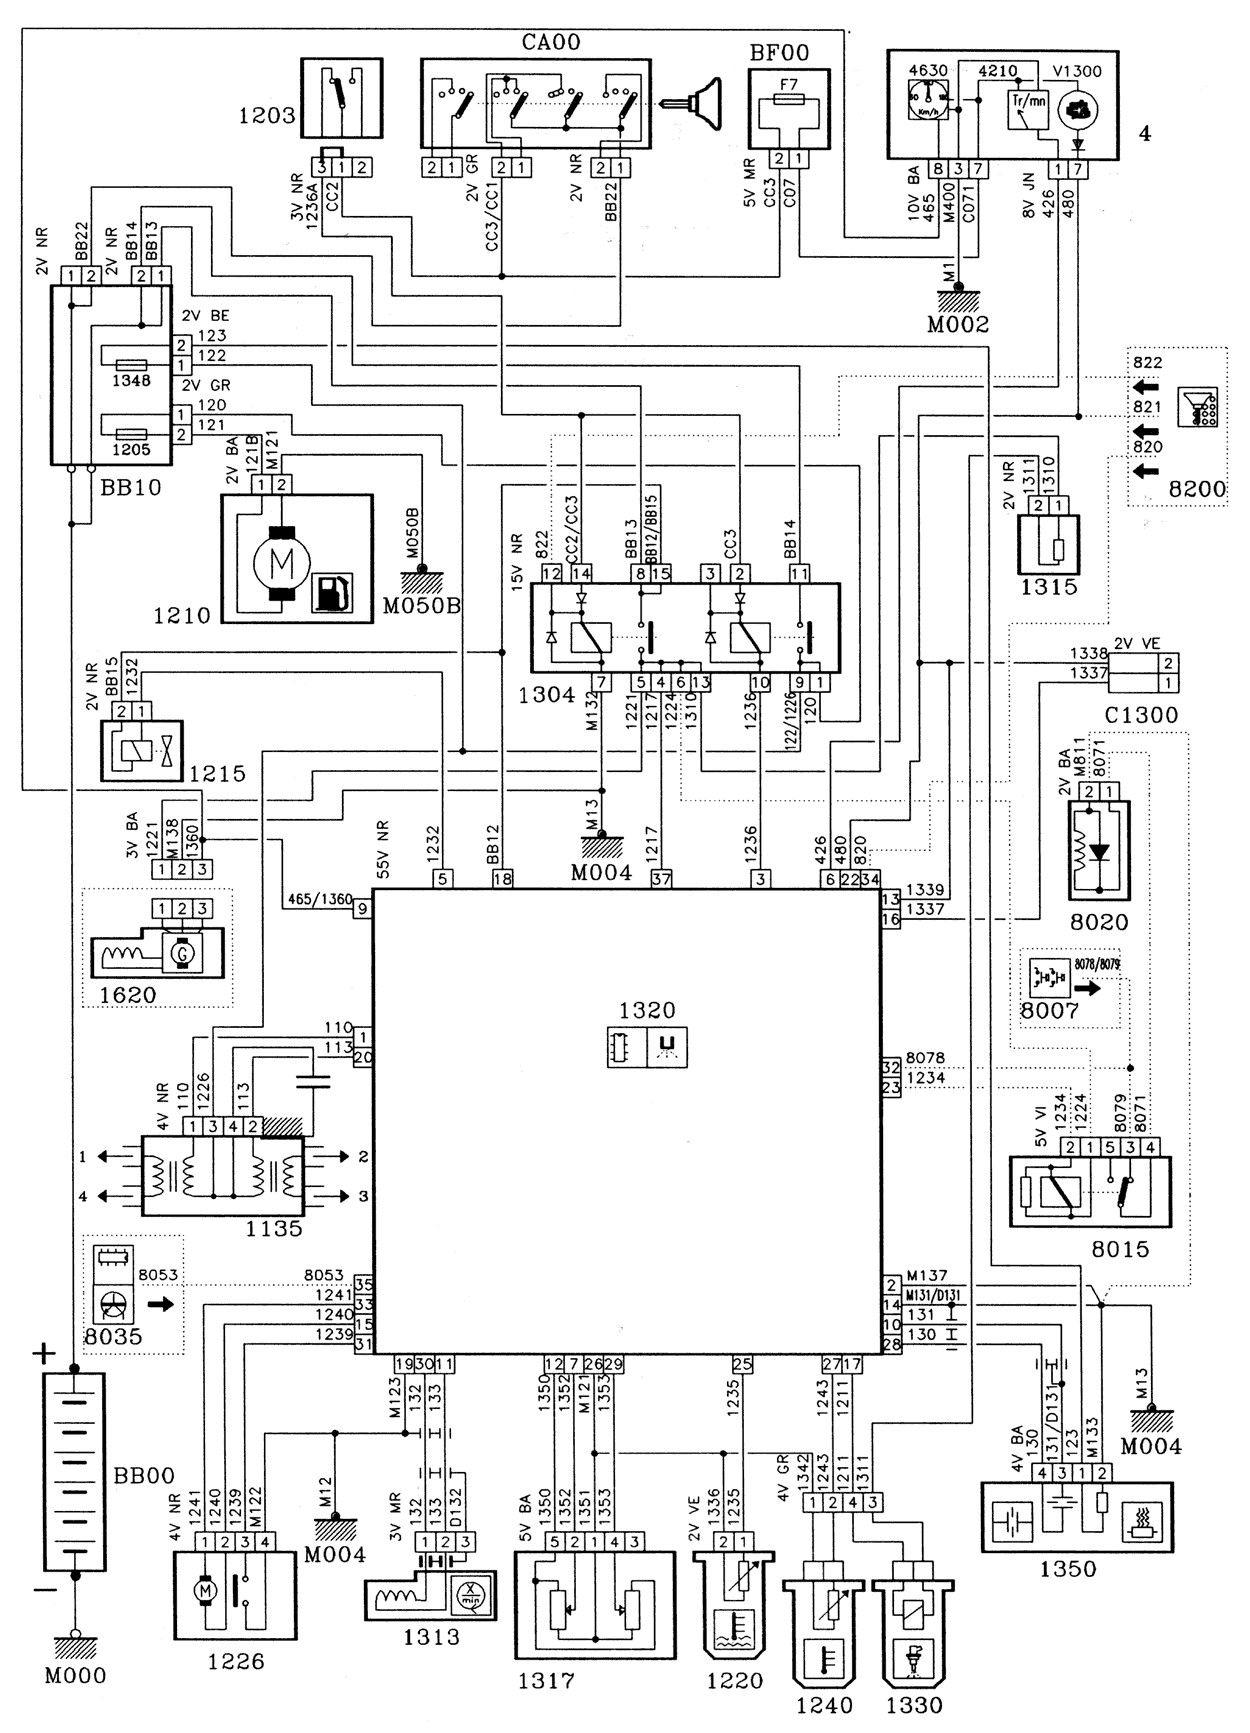 Peugeot 106 Engine Diagram   Peugeot, Diagram, Engine typesPinterest